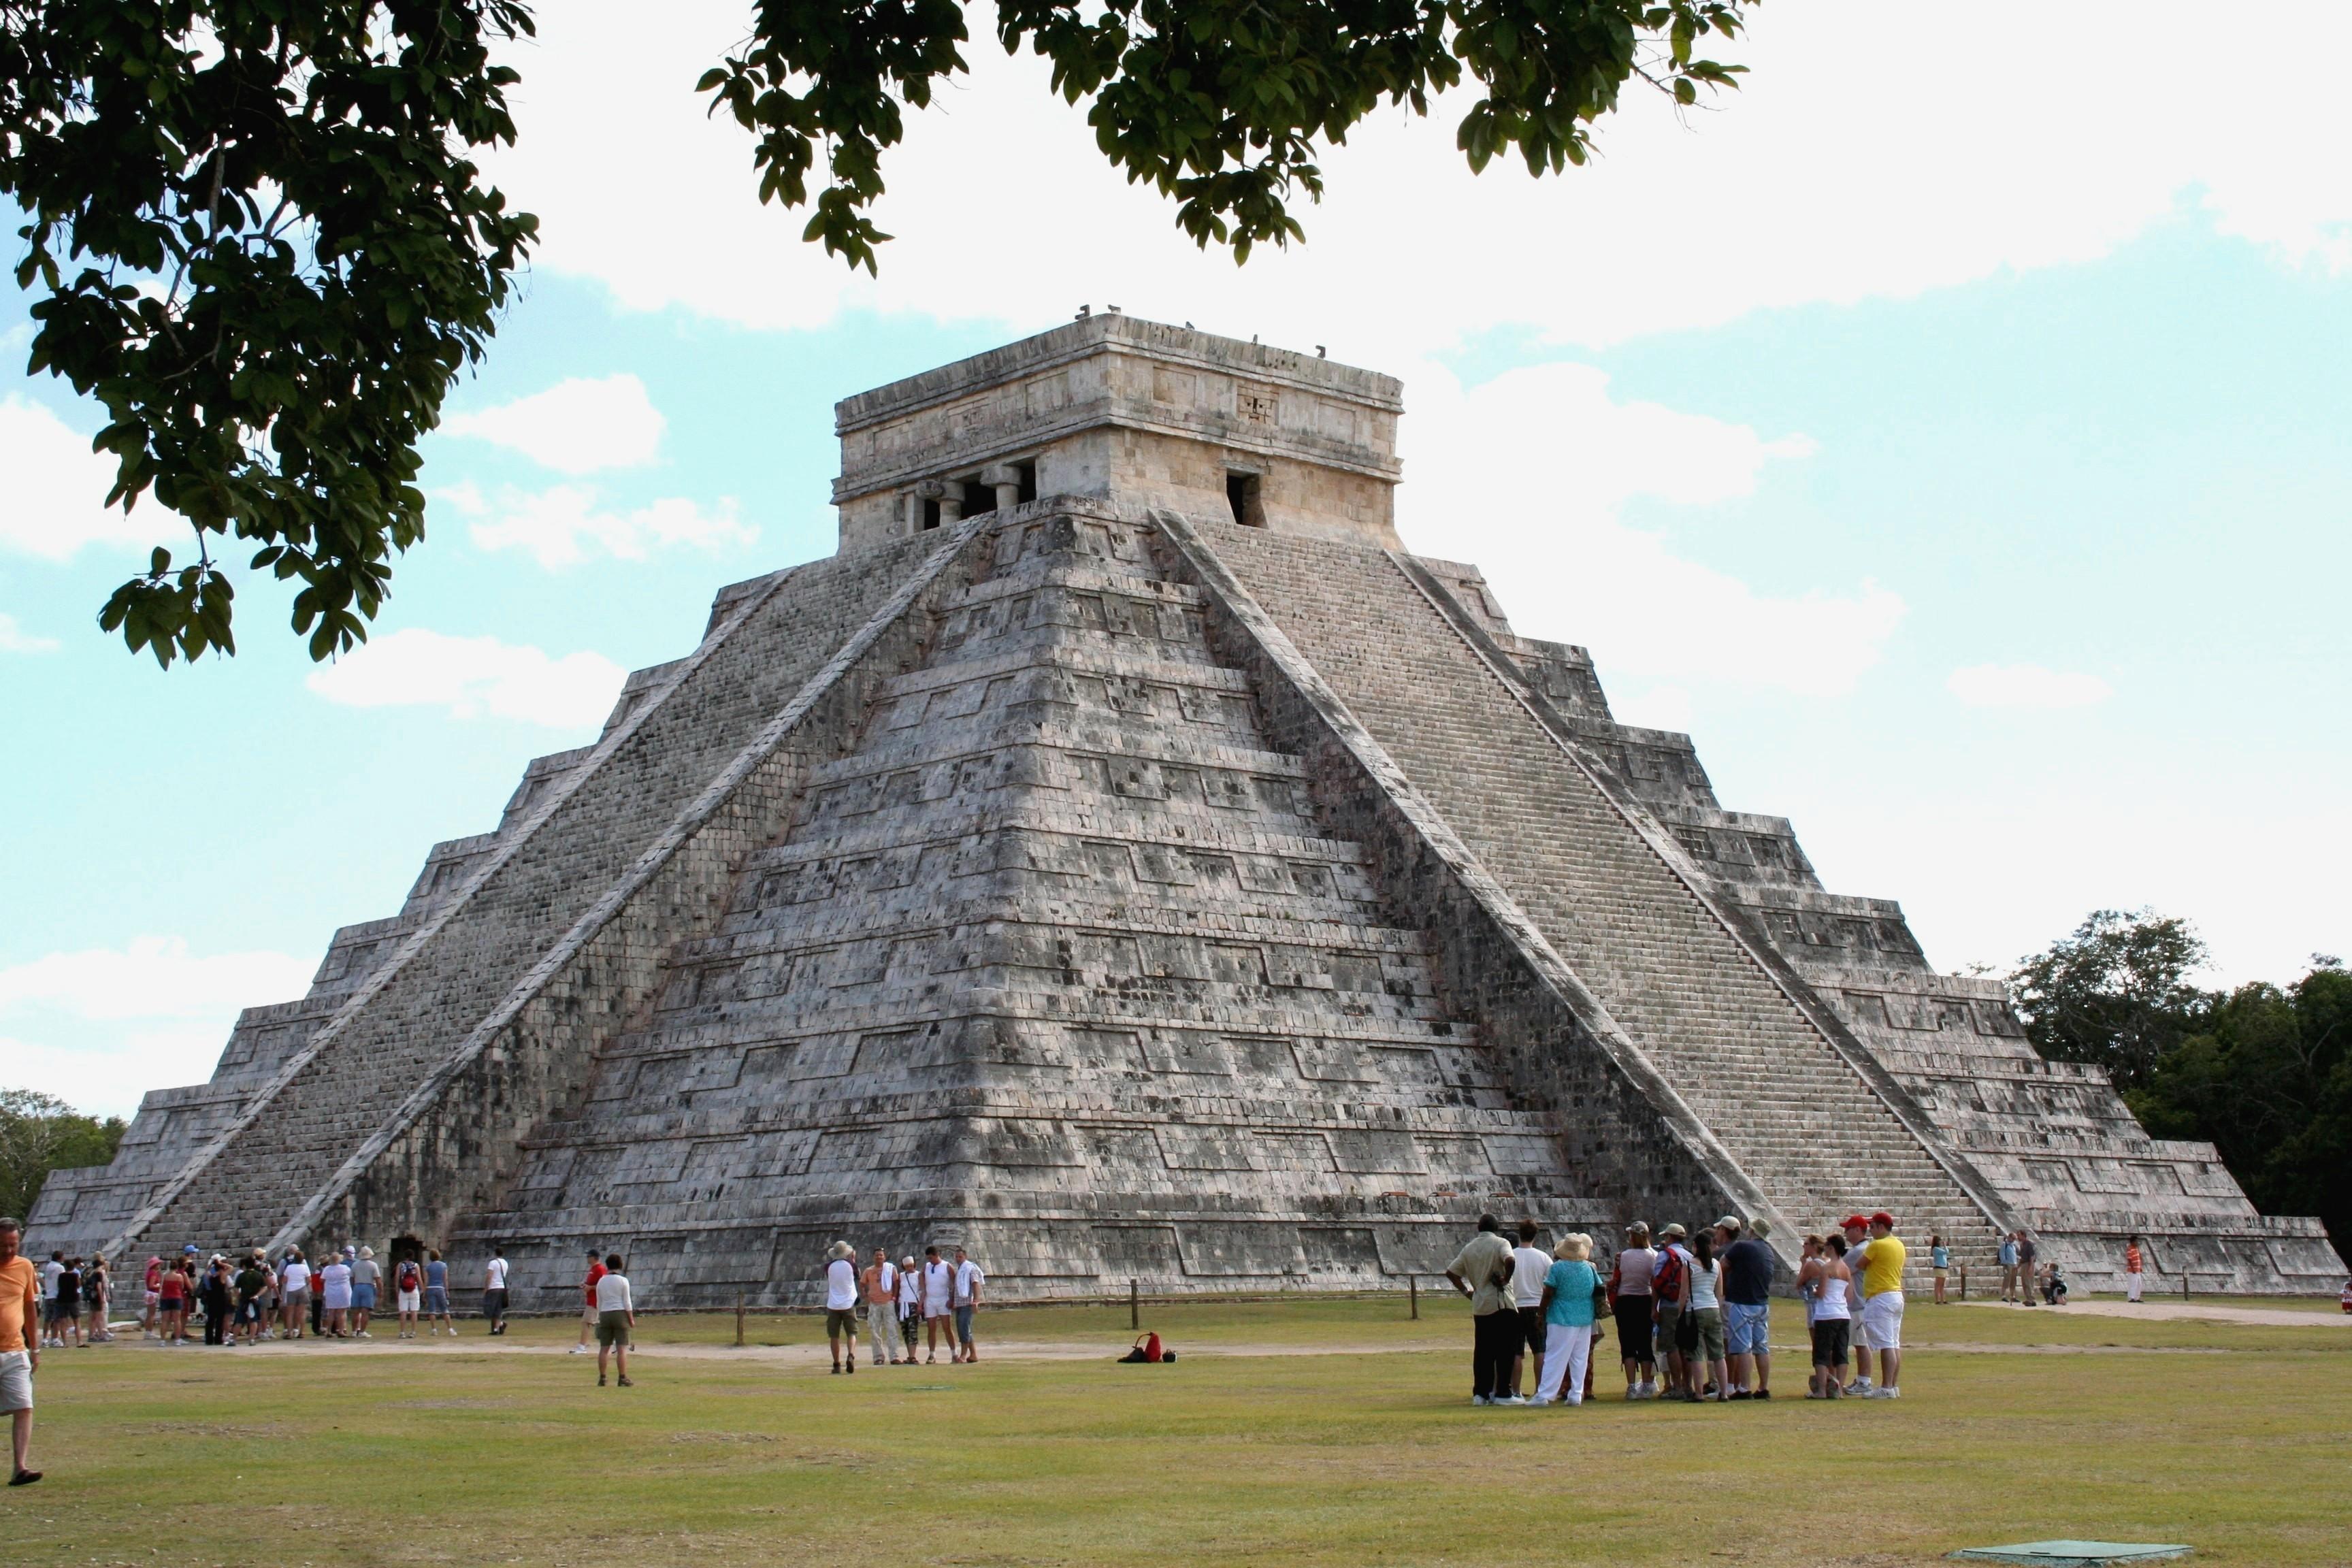 El Castillo Pyramid at Chichen Itza